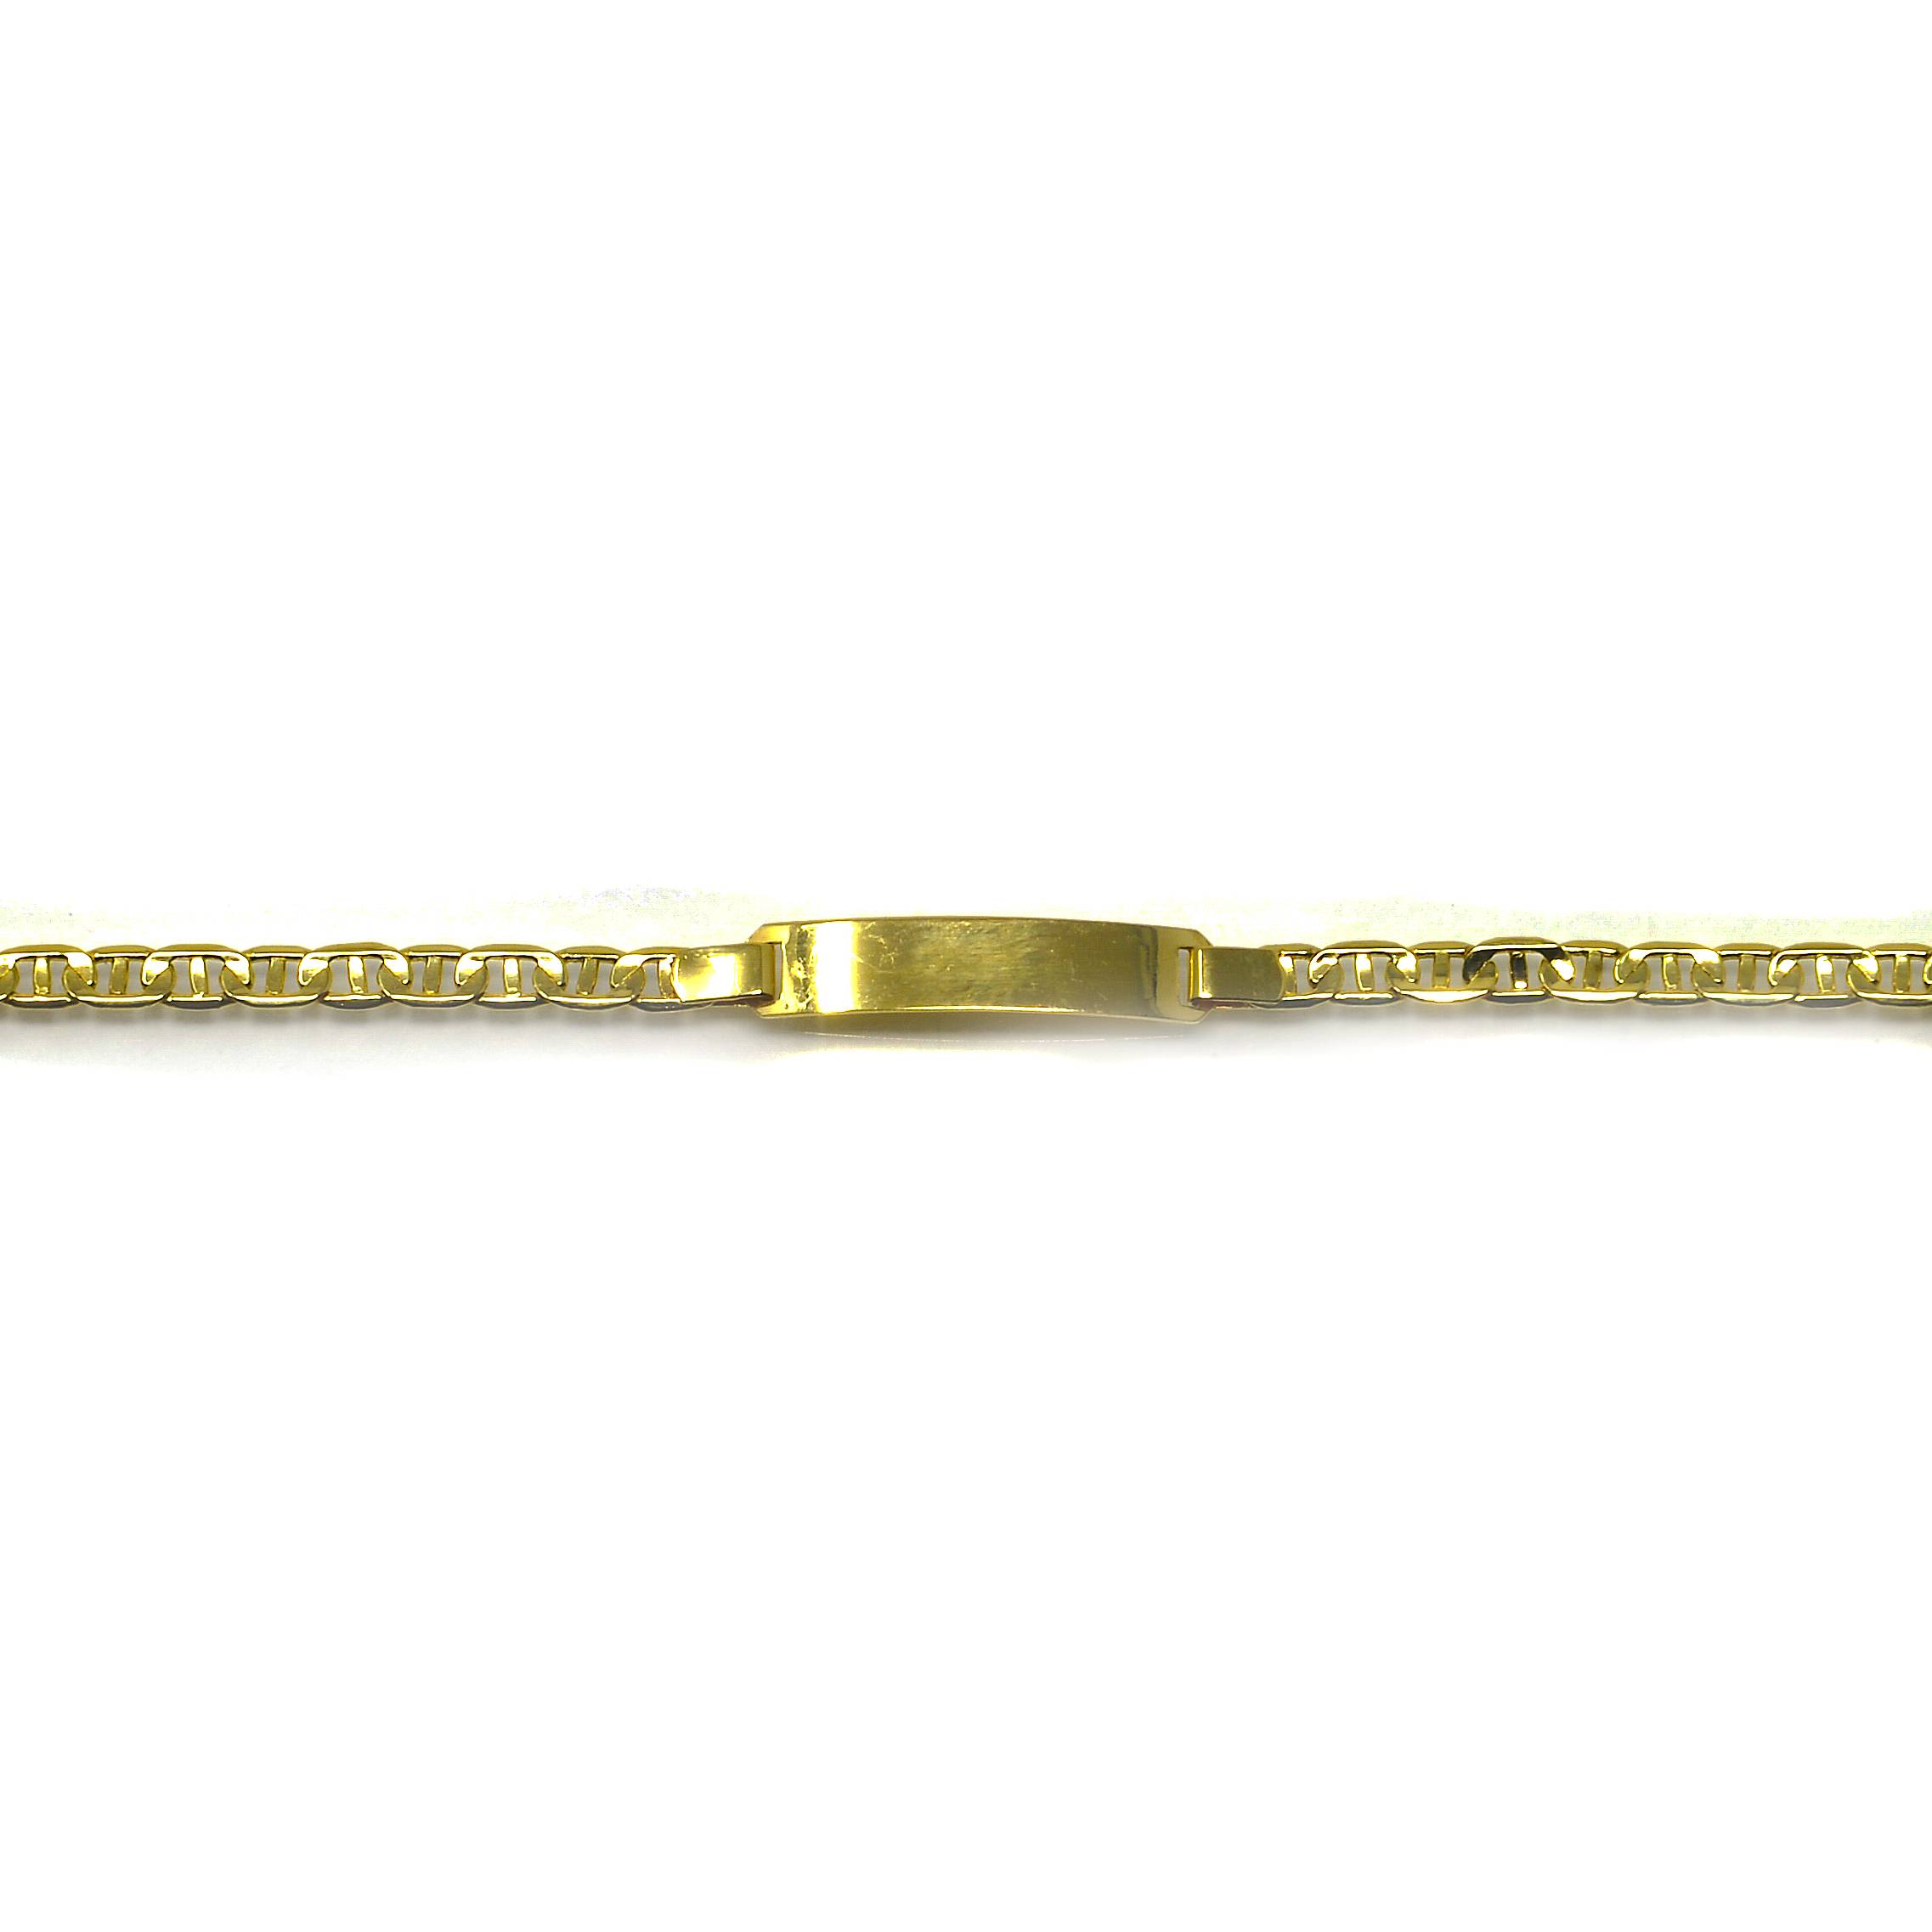 Bracelet identité marine Or 18 carats 4